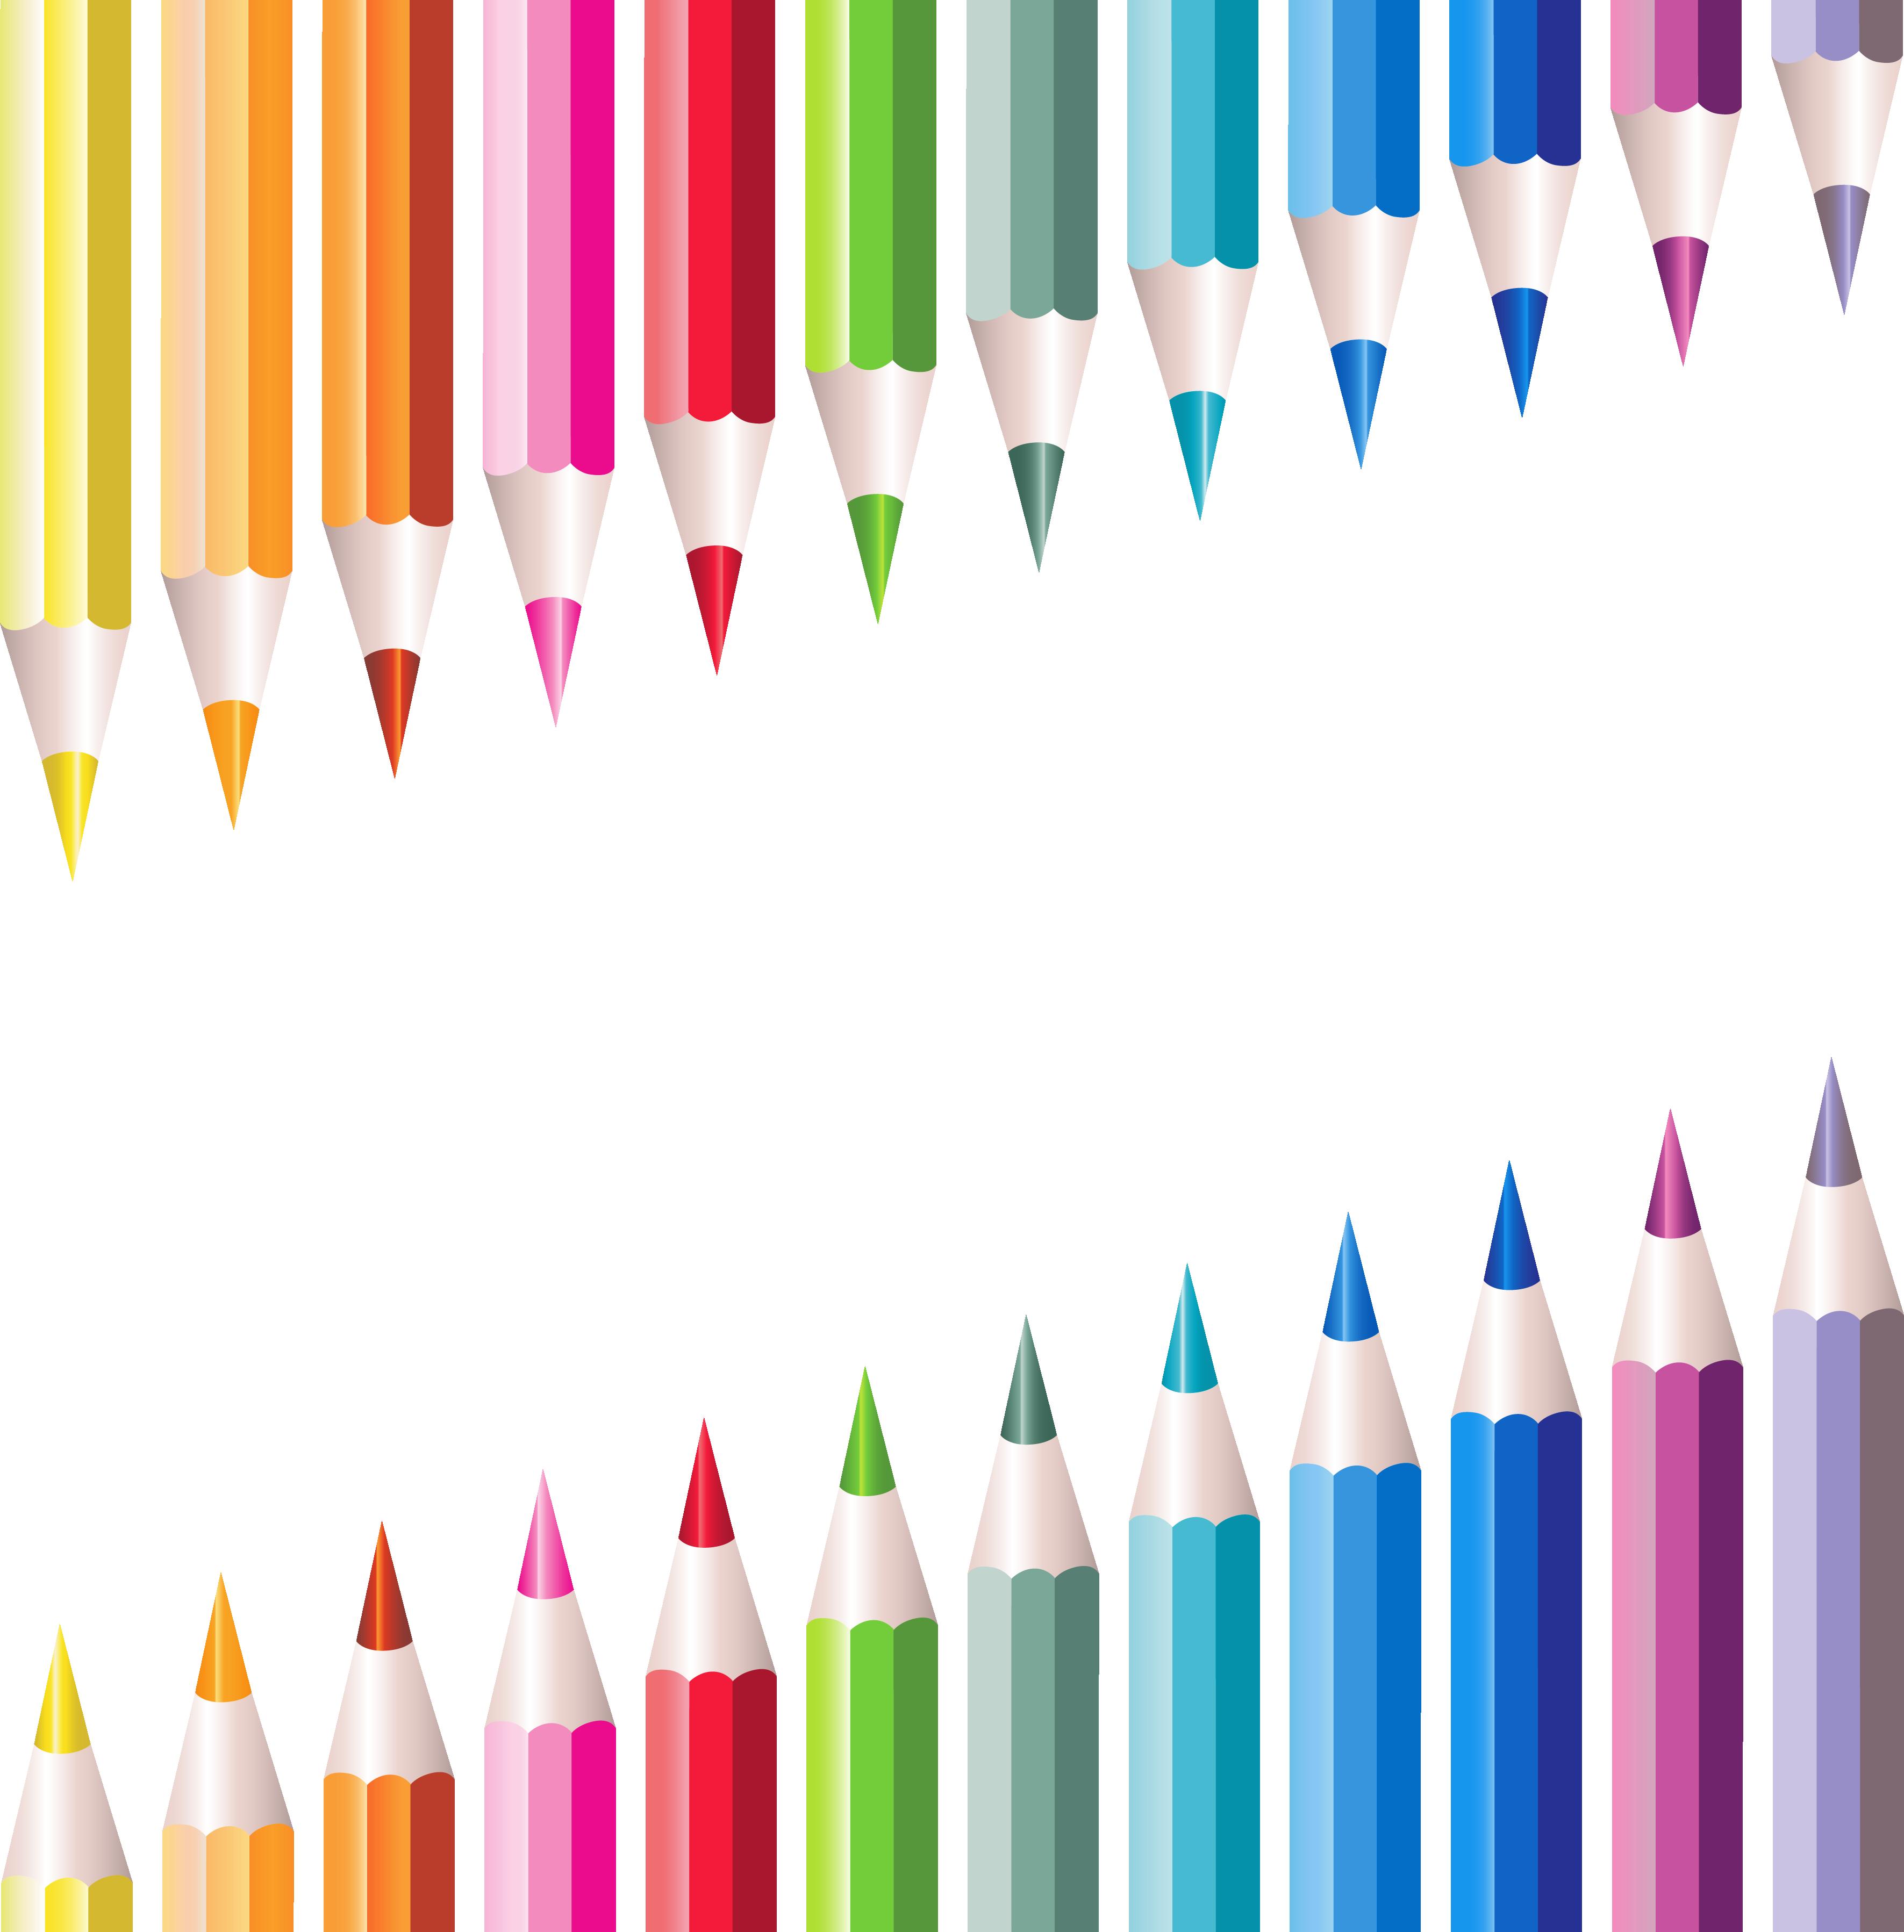 School clipart transparent jpg free stock Transparent School Pencils Decoration | ClipArt | Pinterest ... jpg free stock